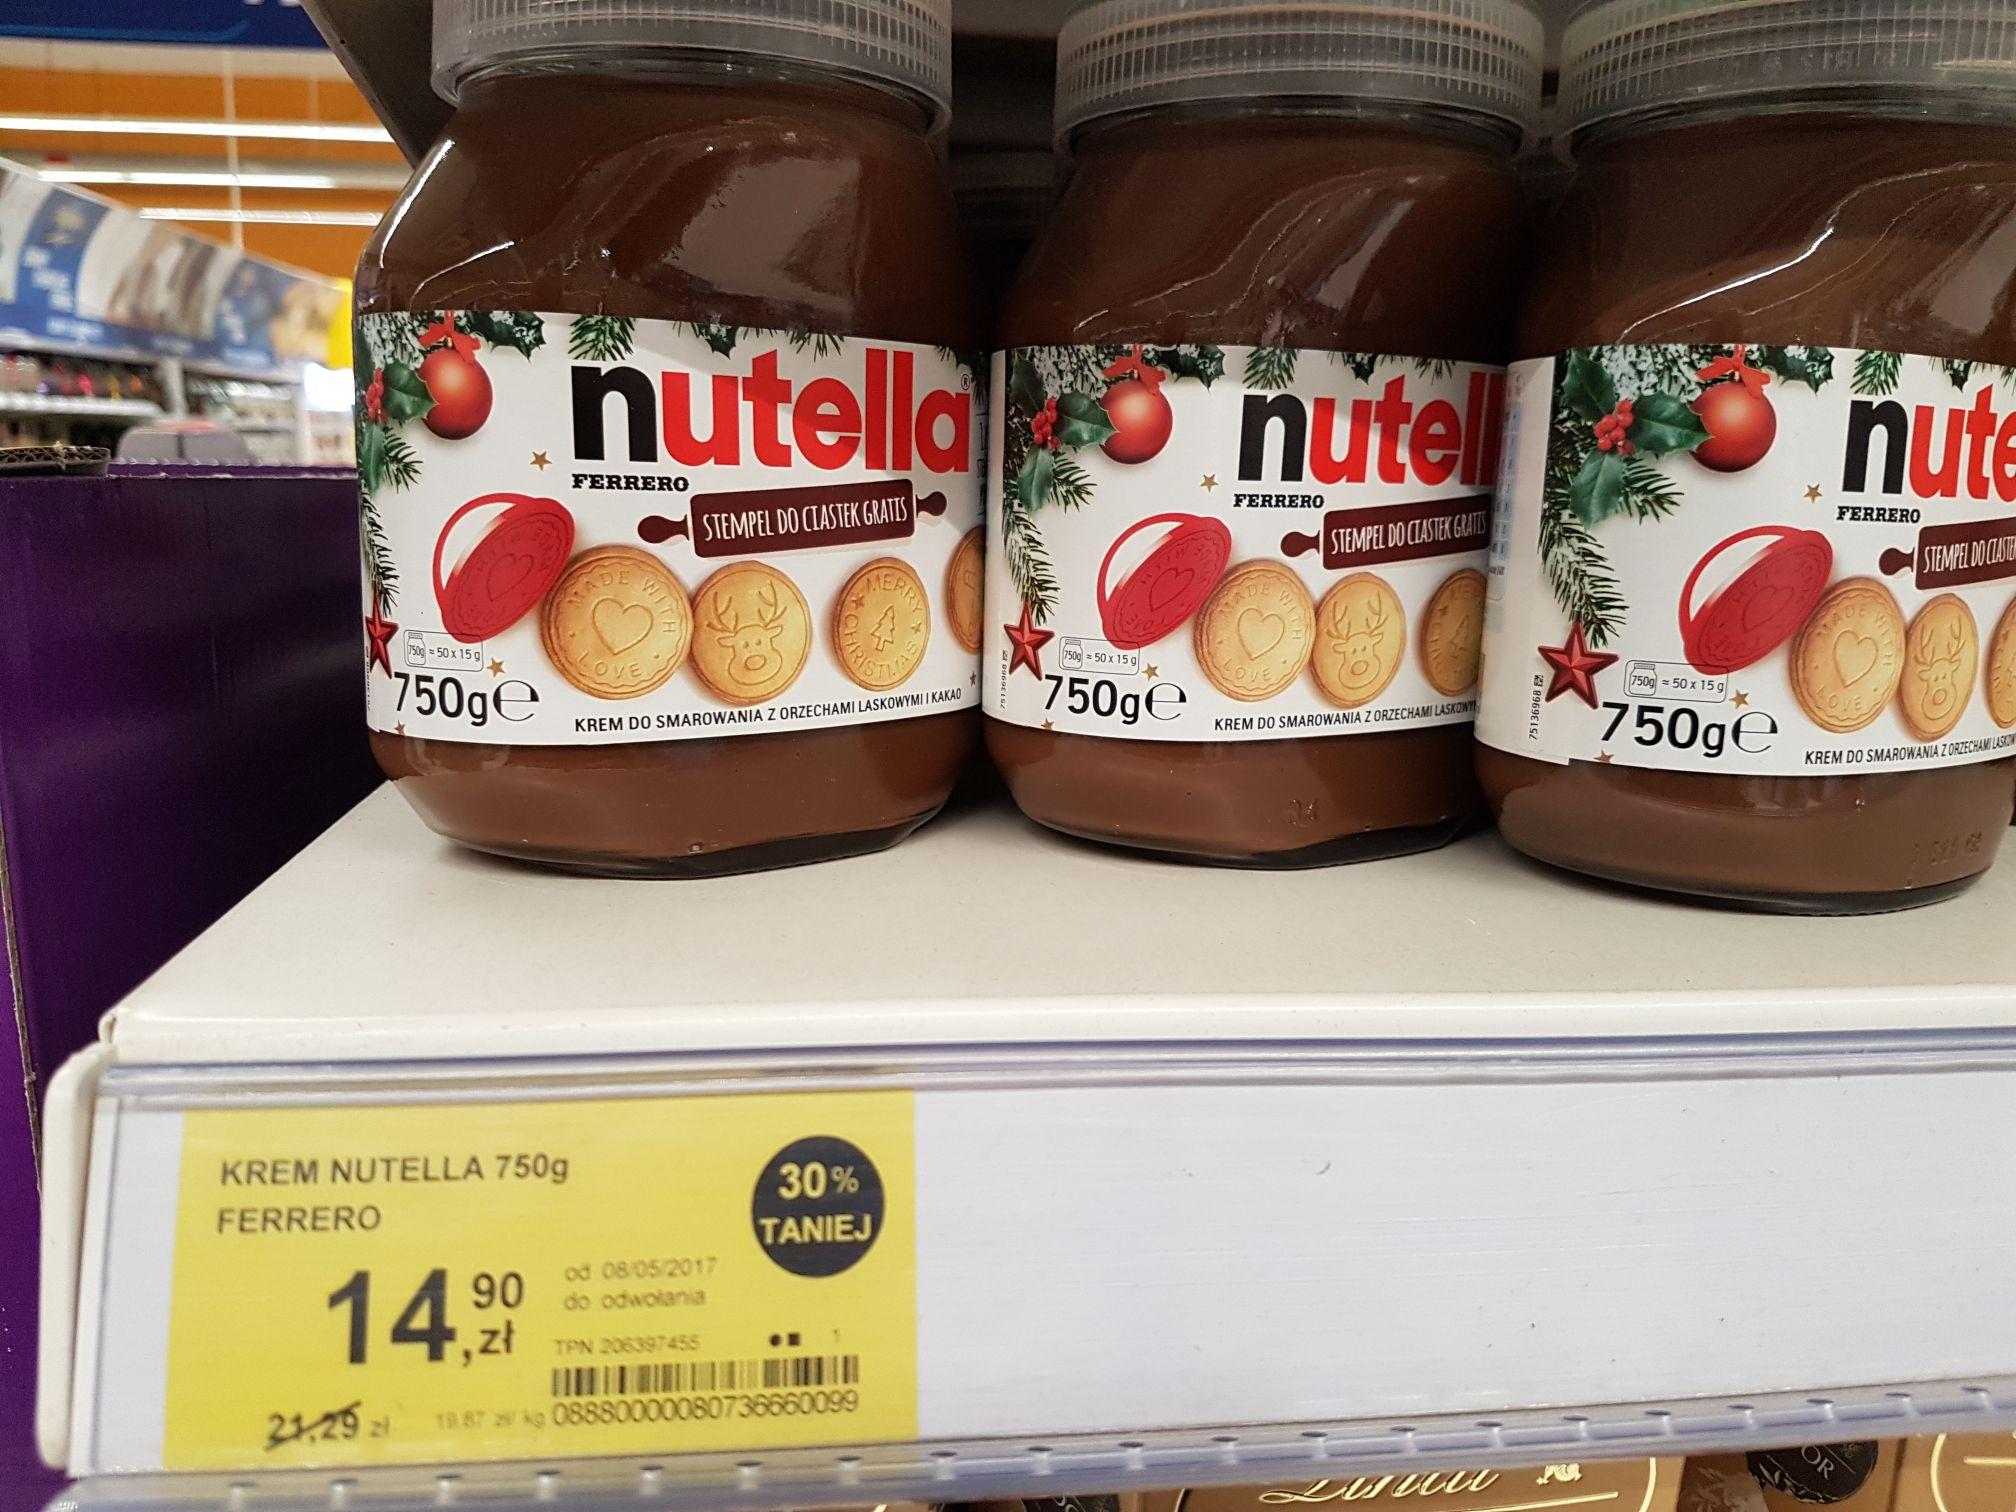 Nutella 750g! #tesco